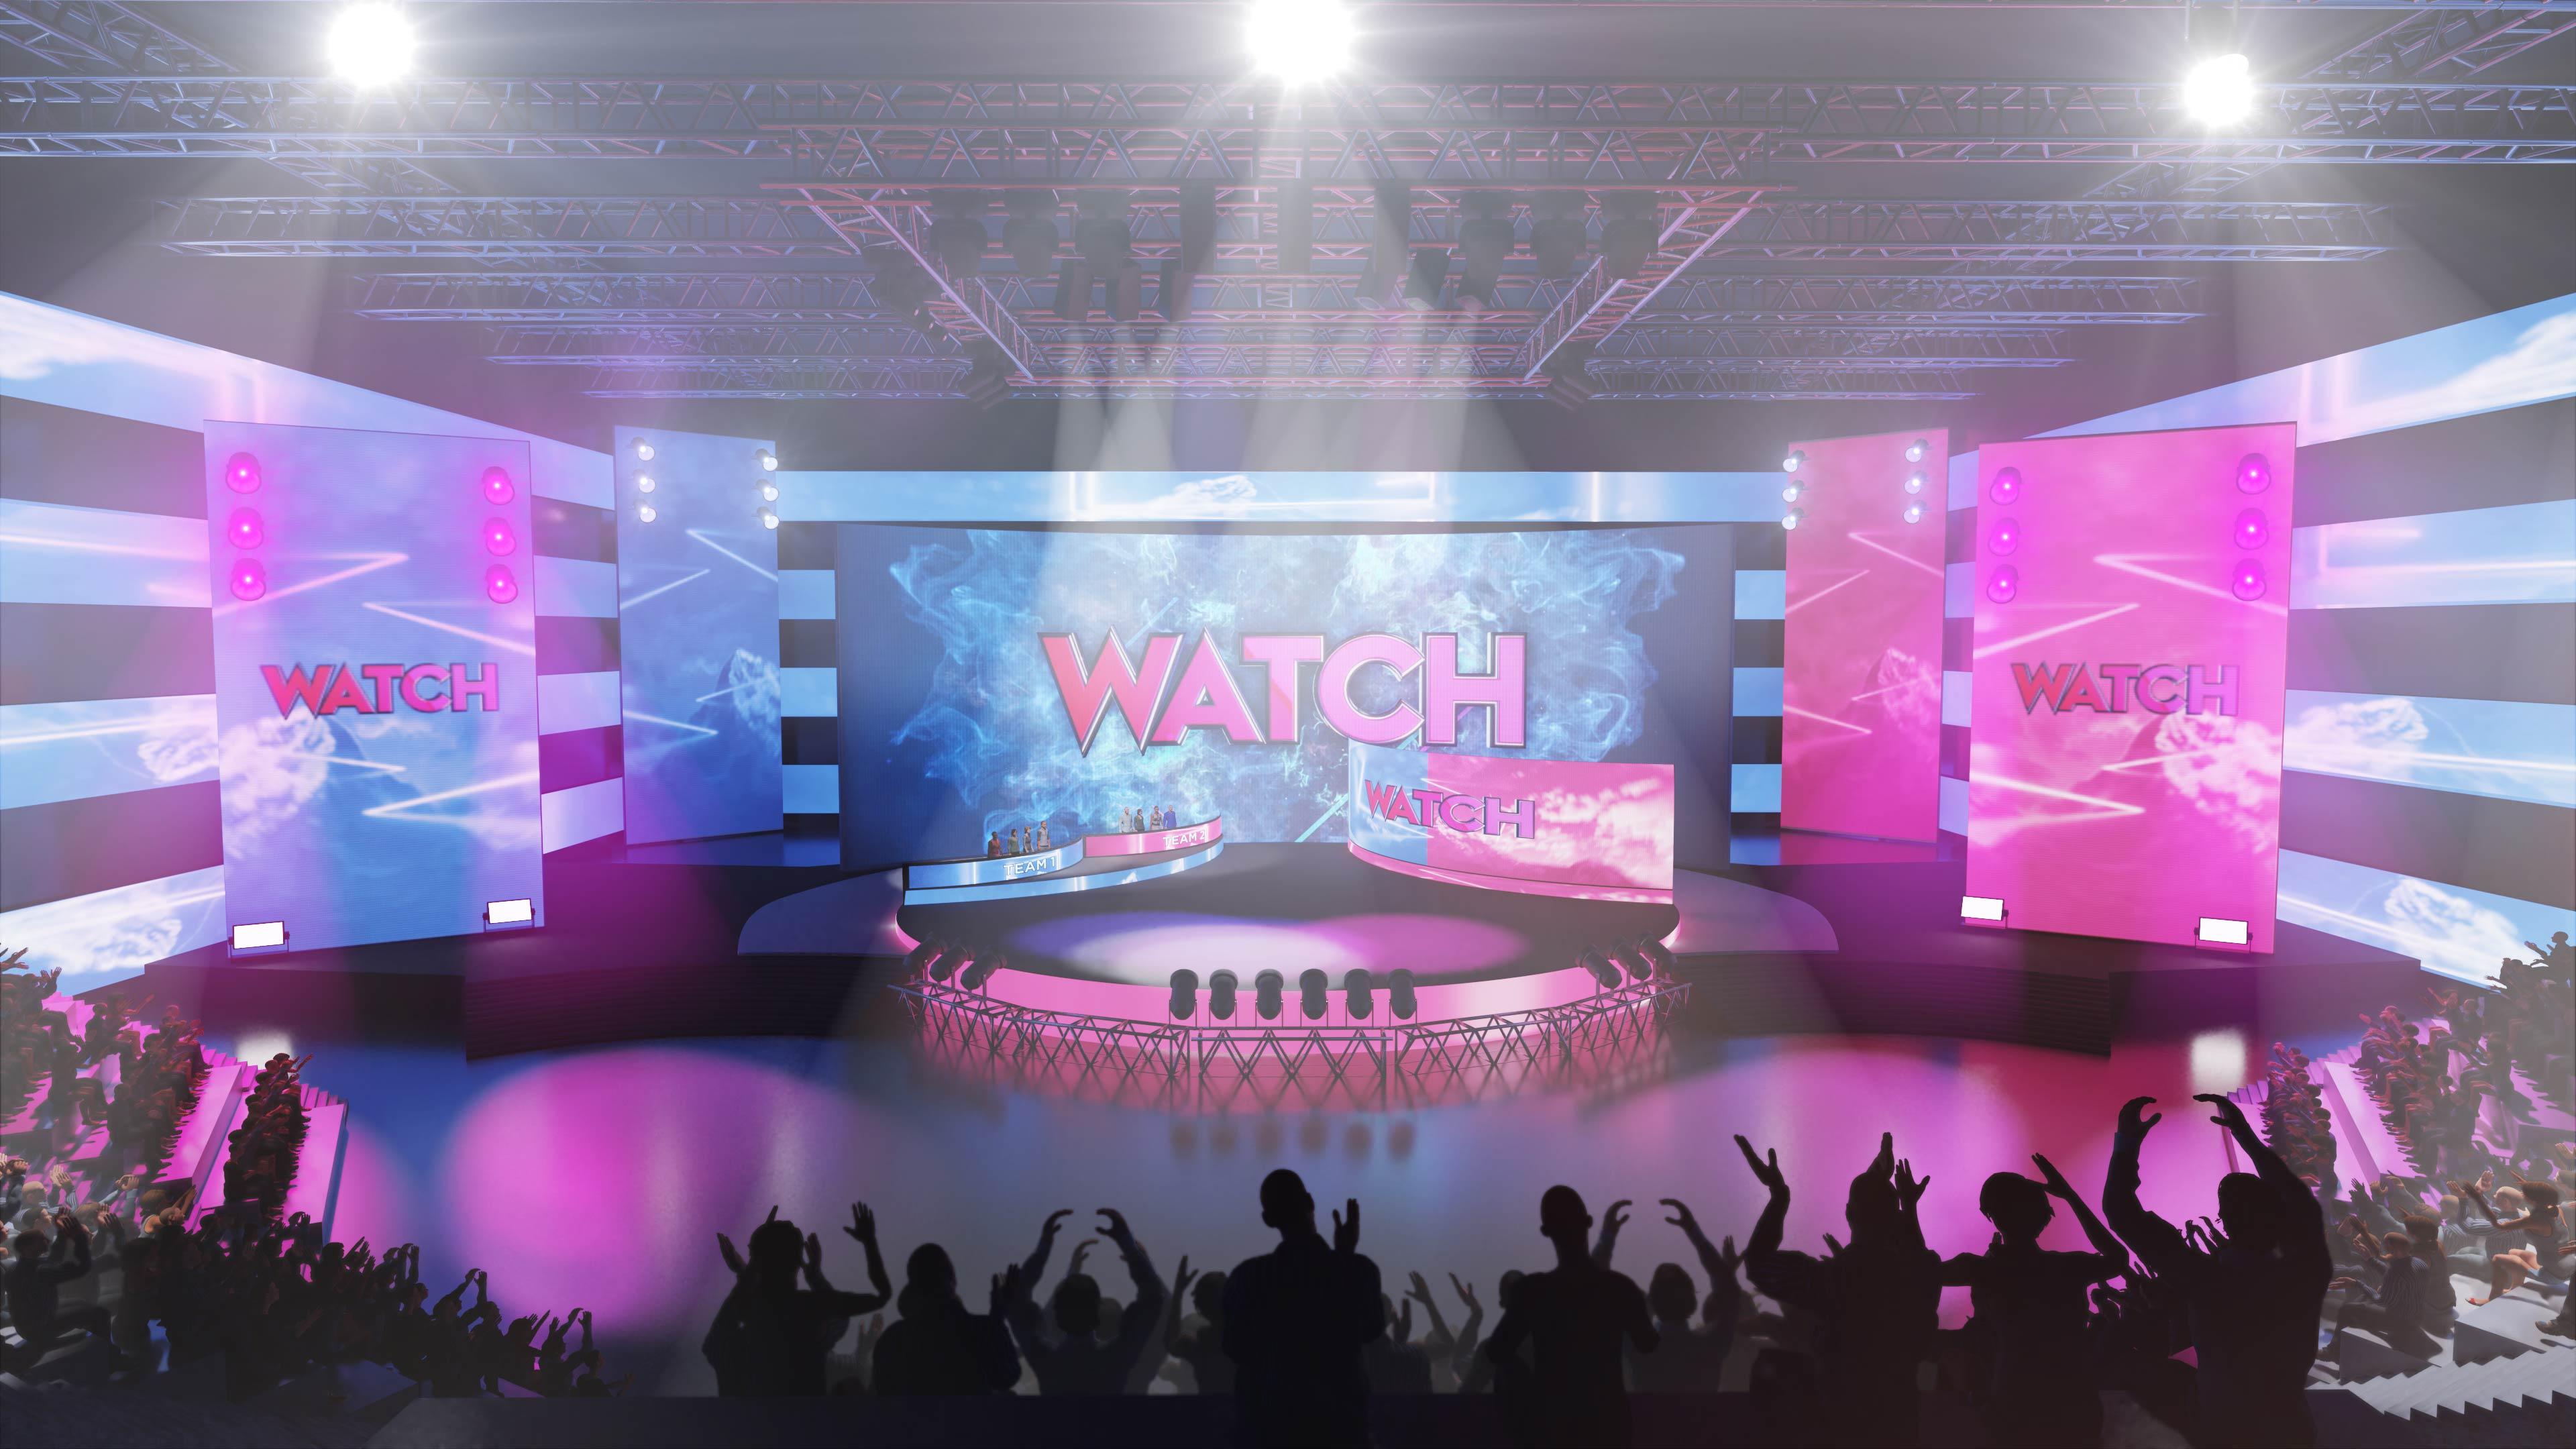 Media Ranch Watch image